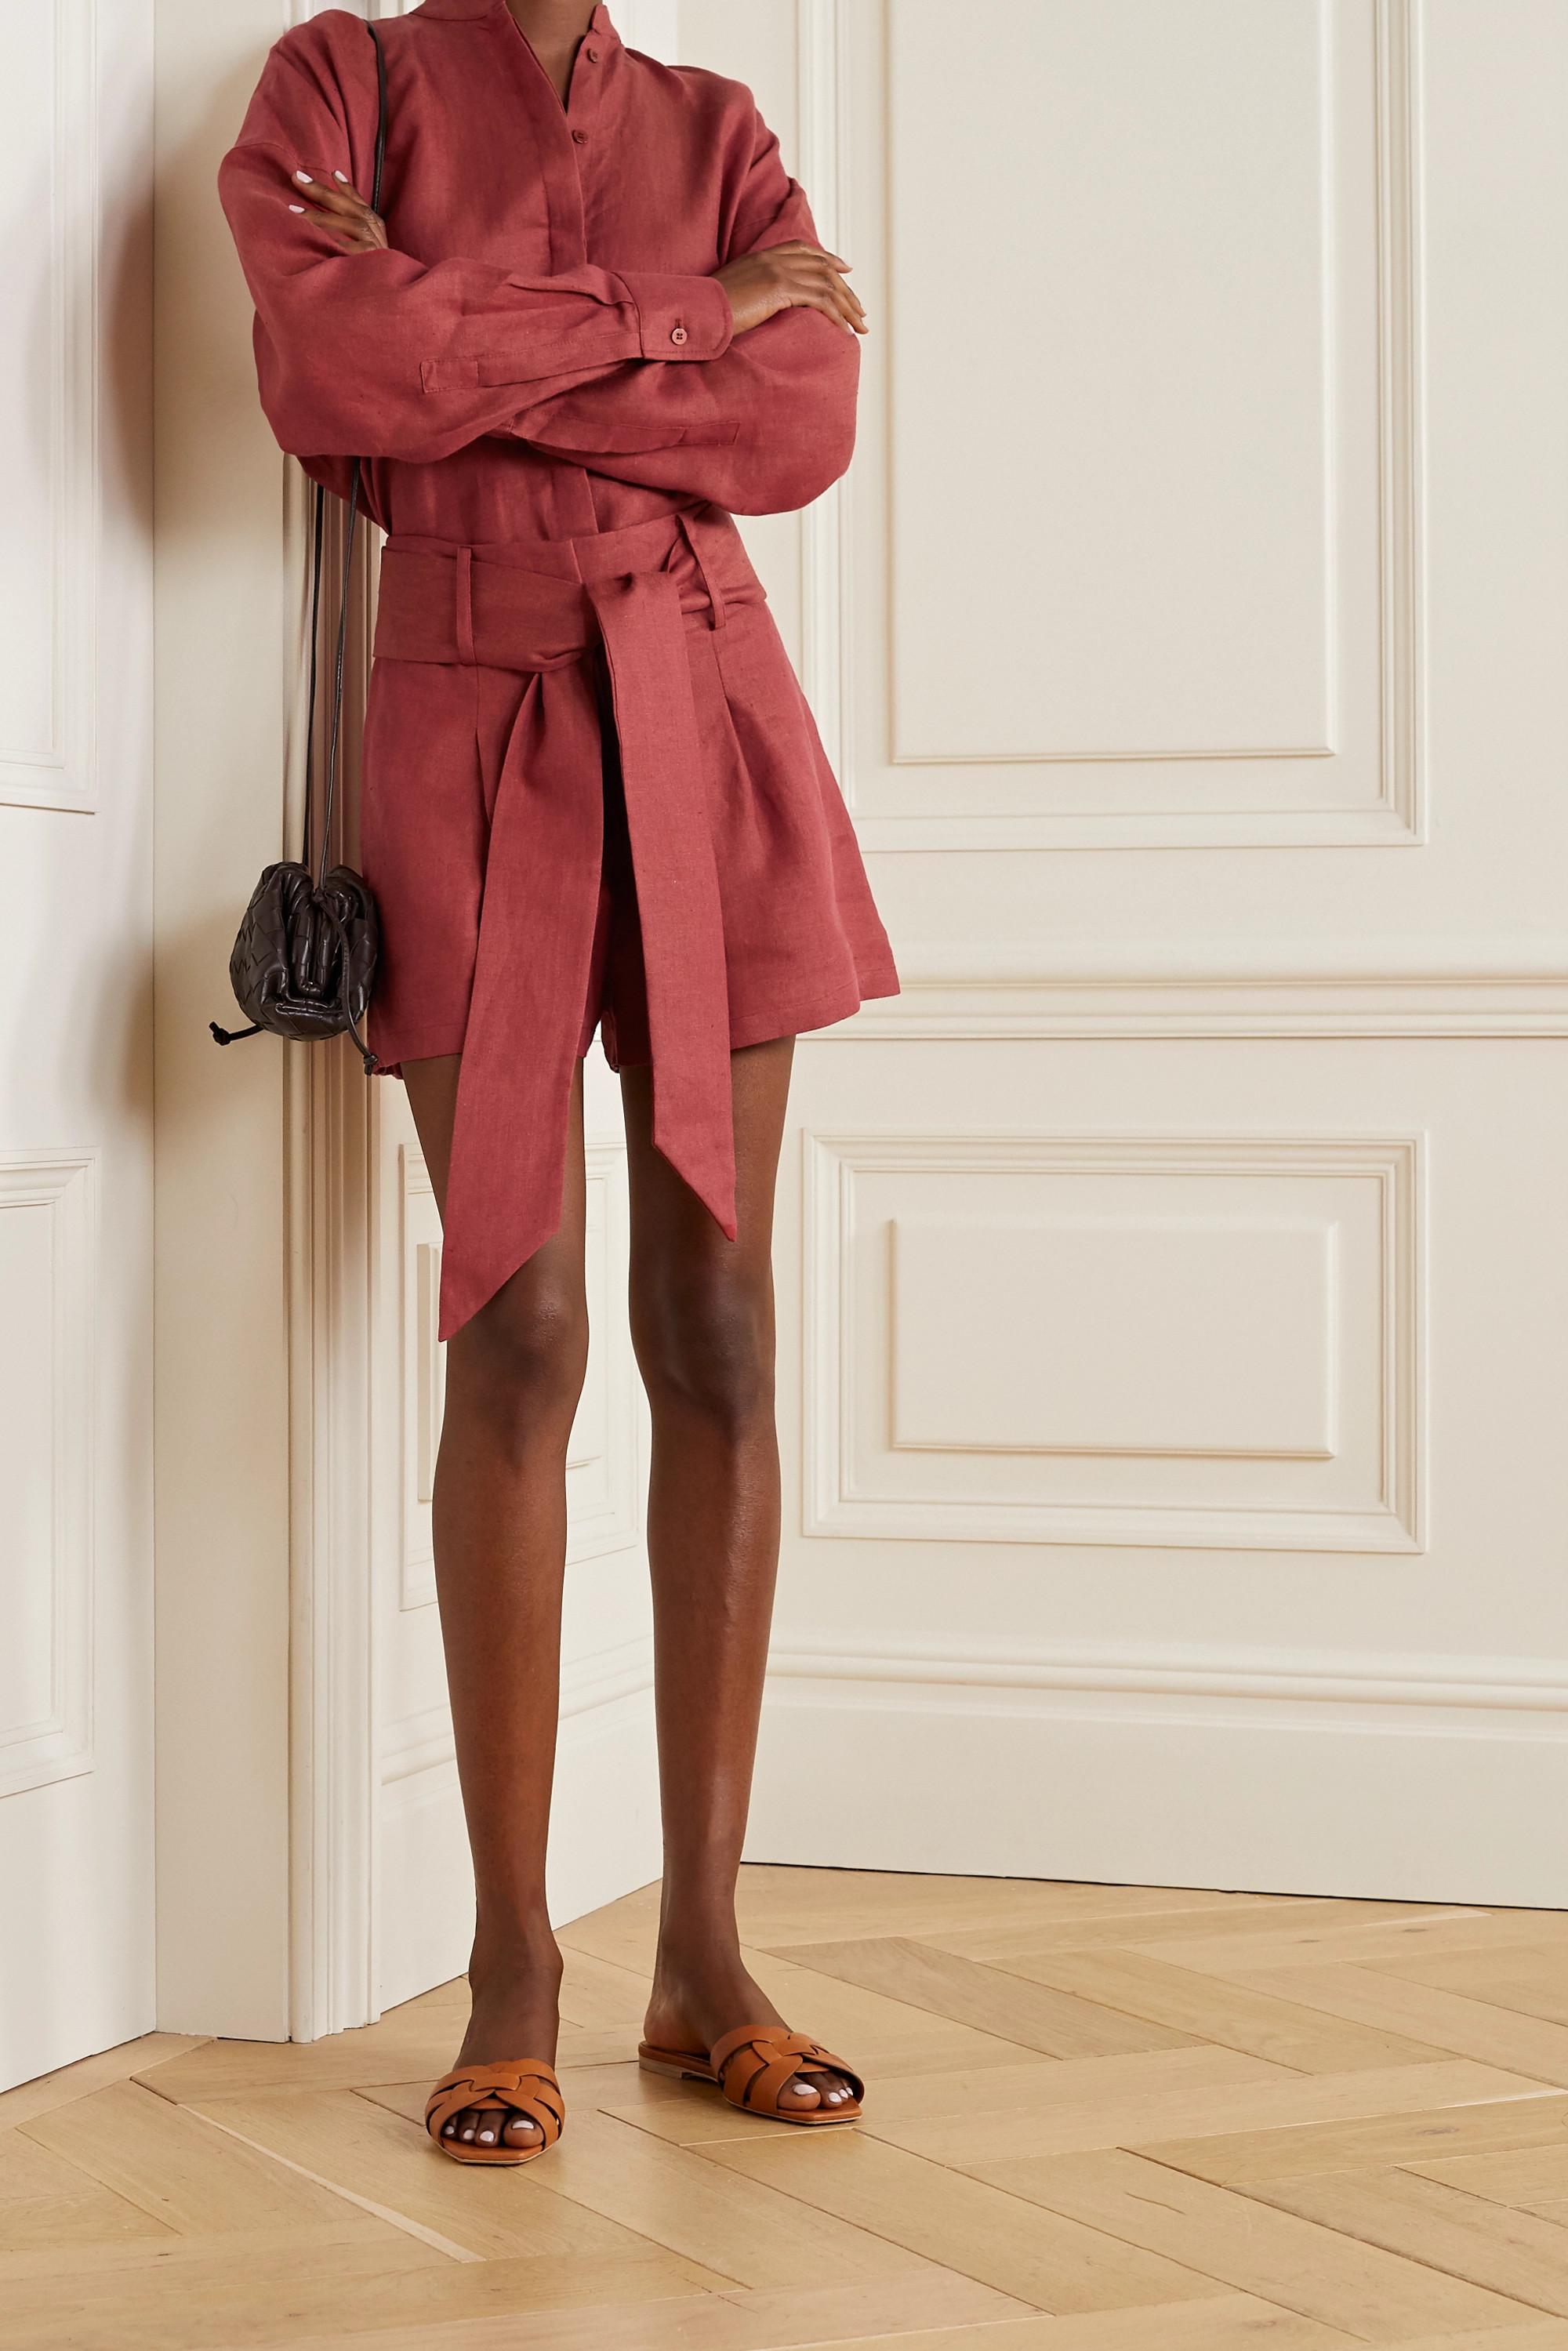 BONDI BORN + NET SUSTAIN Everywhere linen shirt